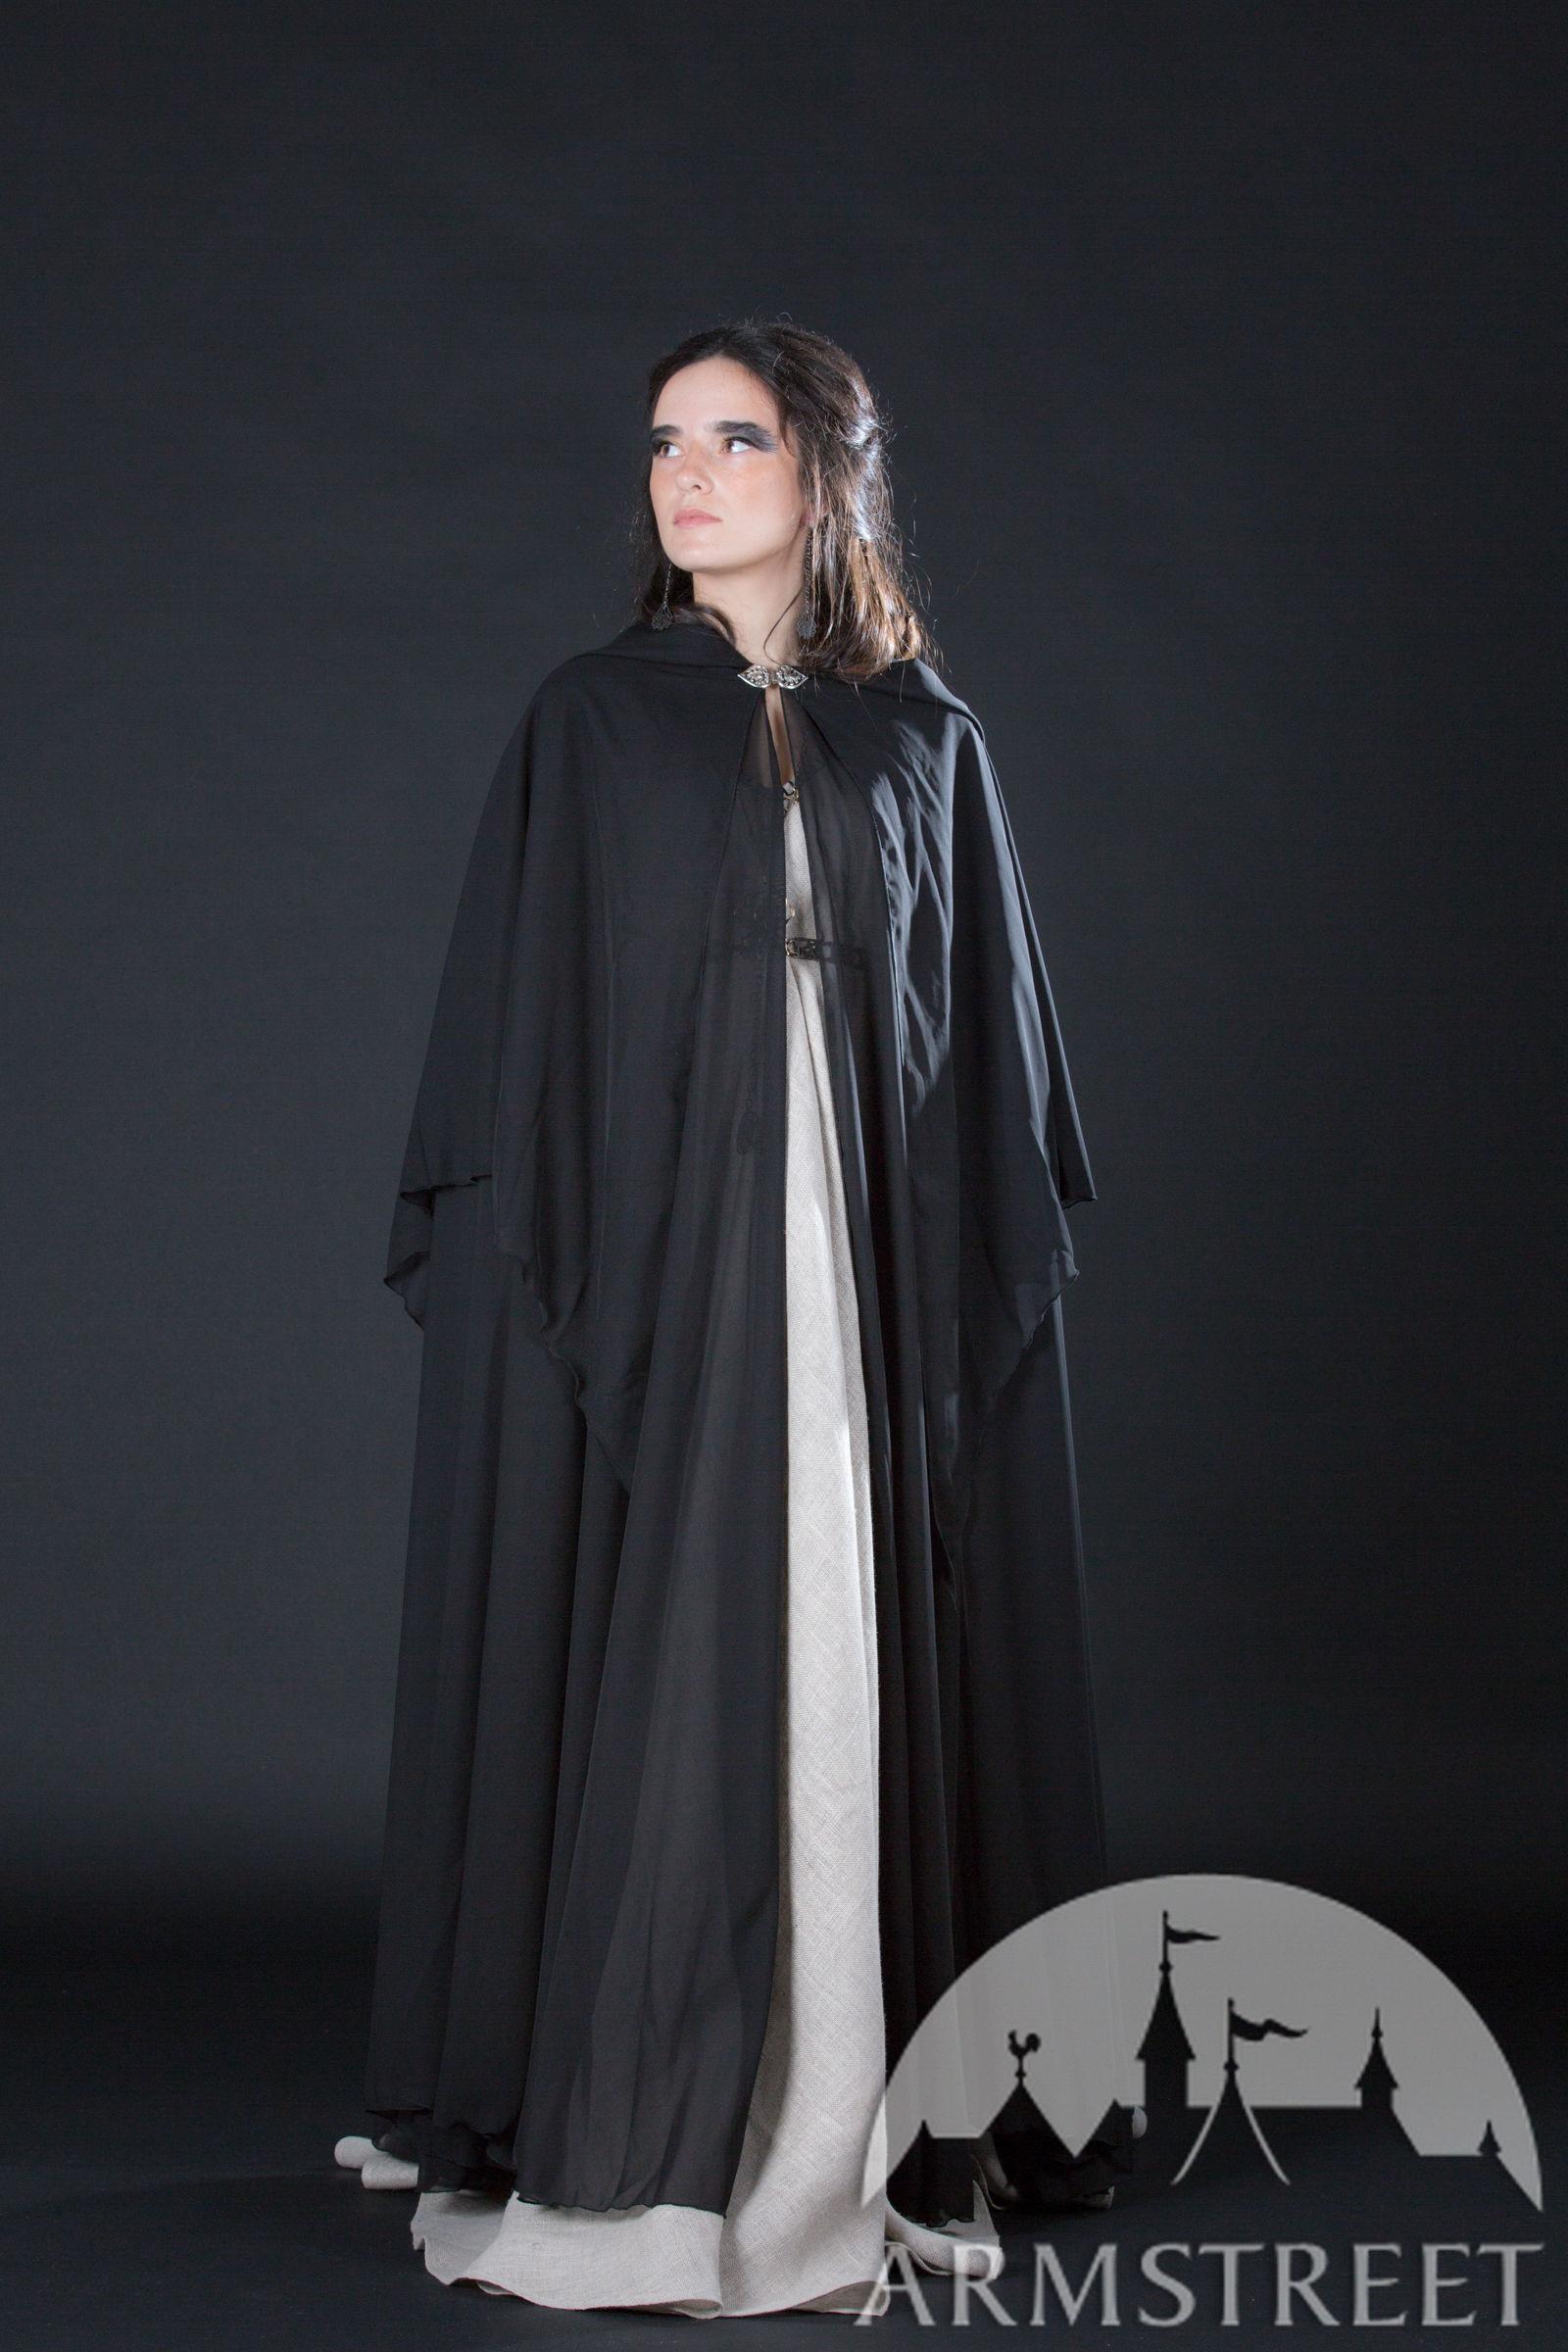 Black semitransparent medieval fantasy cloak robe for